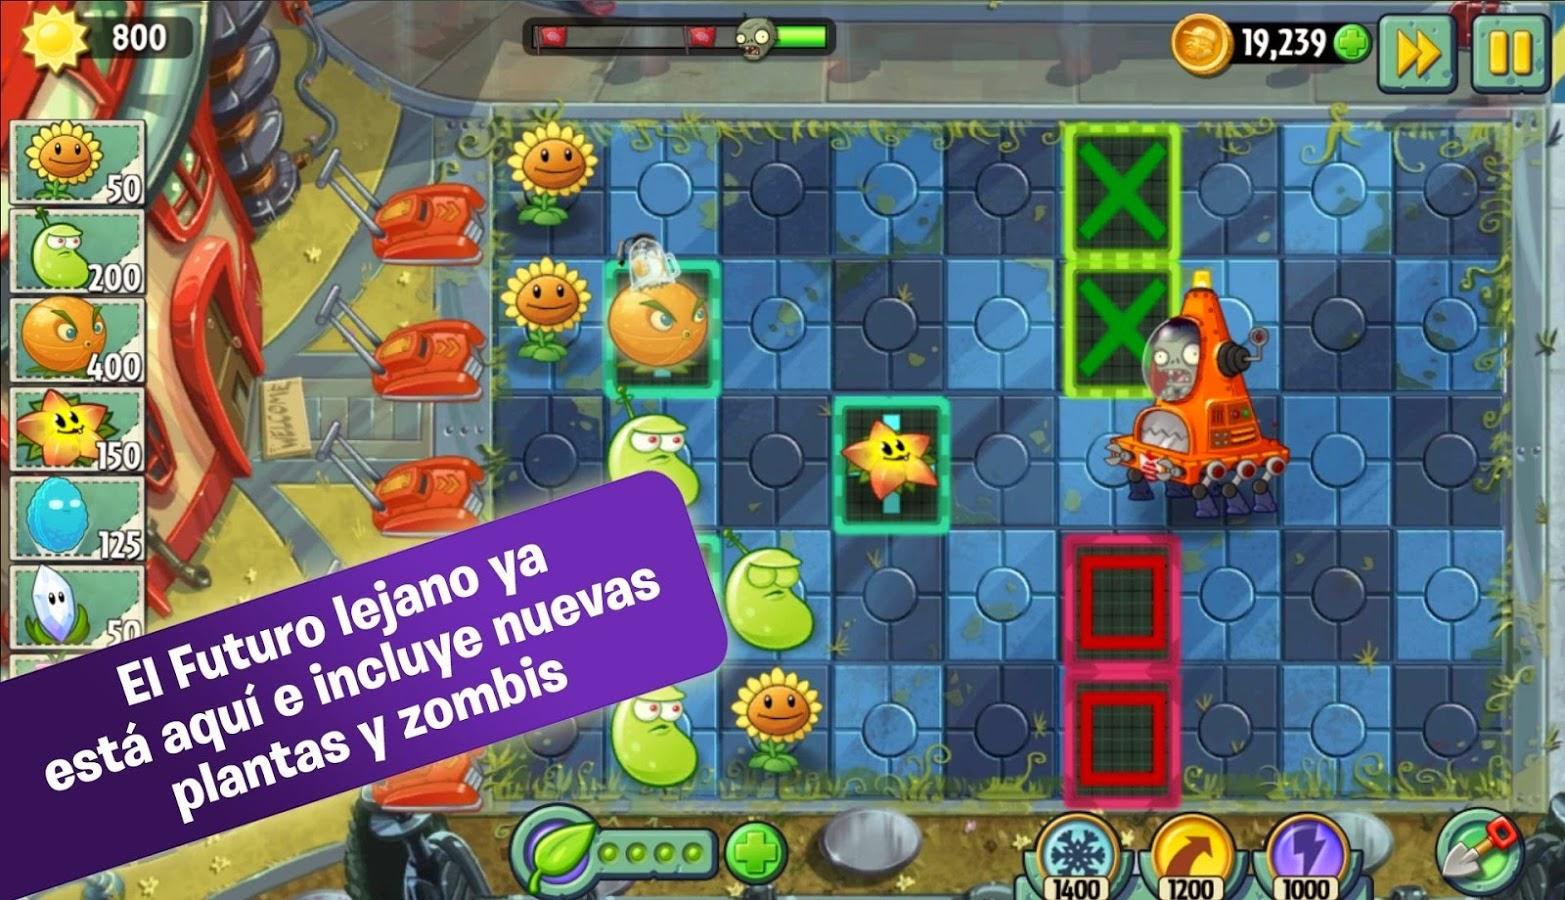 03+Descargar+Plants+vs.+Zombies+2%E2%84%A2+v2.1.1+.apk+2.1.1+APK